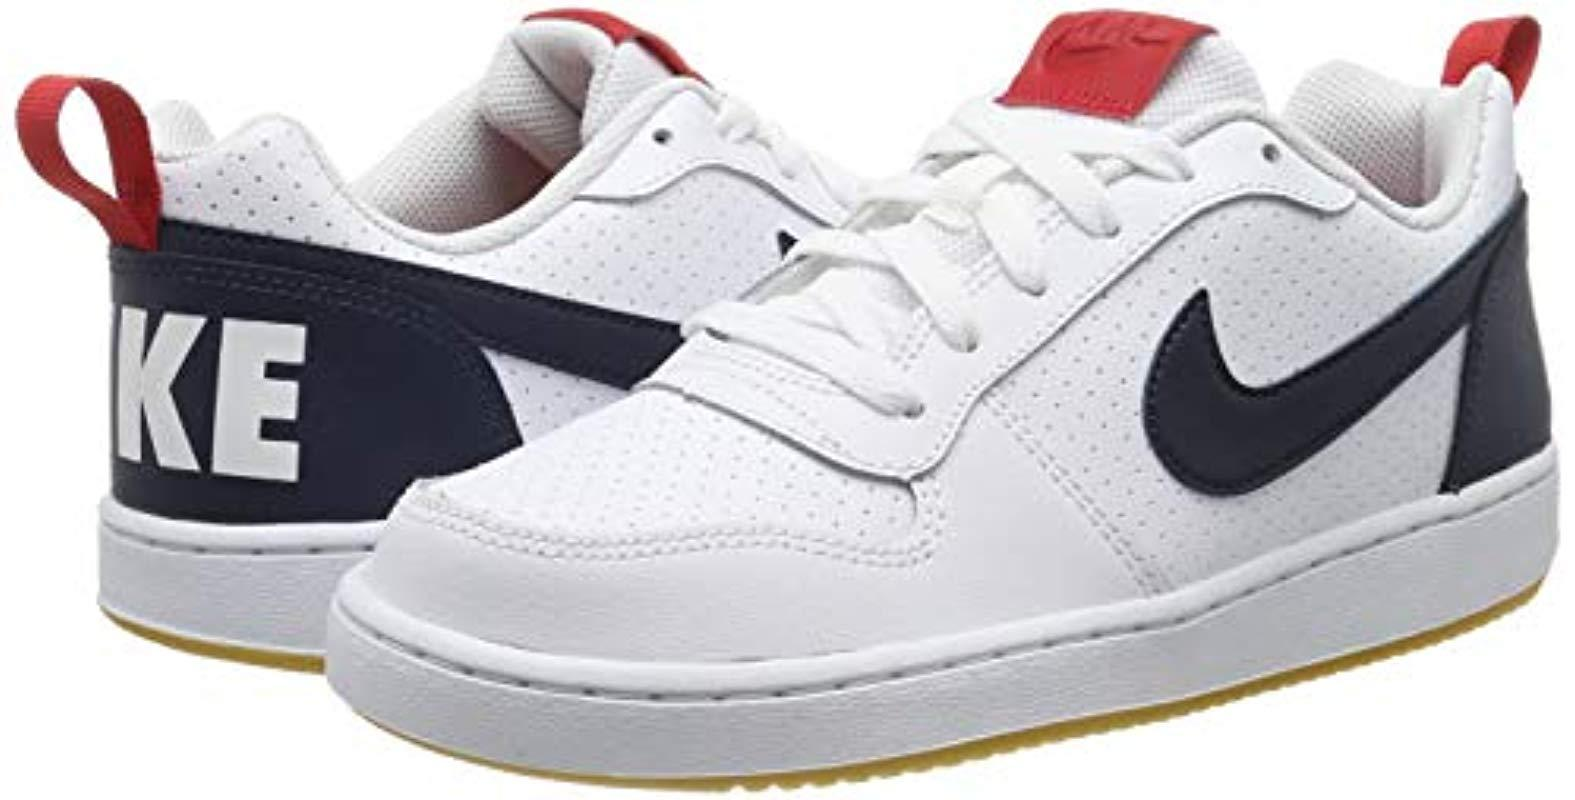 Court Borough Low (GS), Zapatos de Baloncesto para Niños Nike de hombre de color Blanco